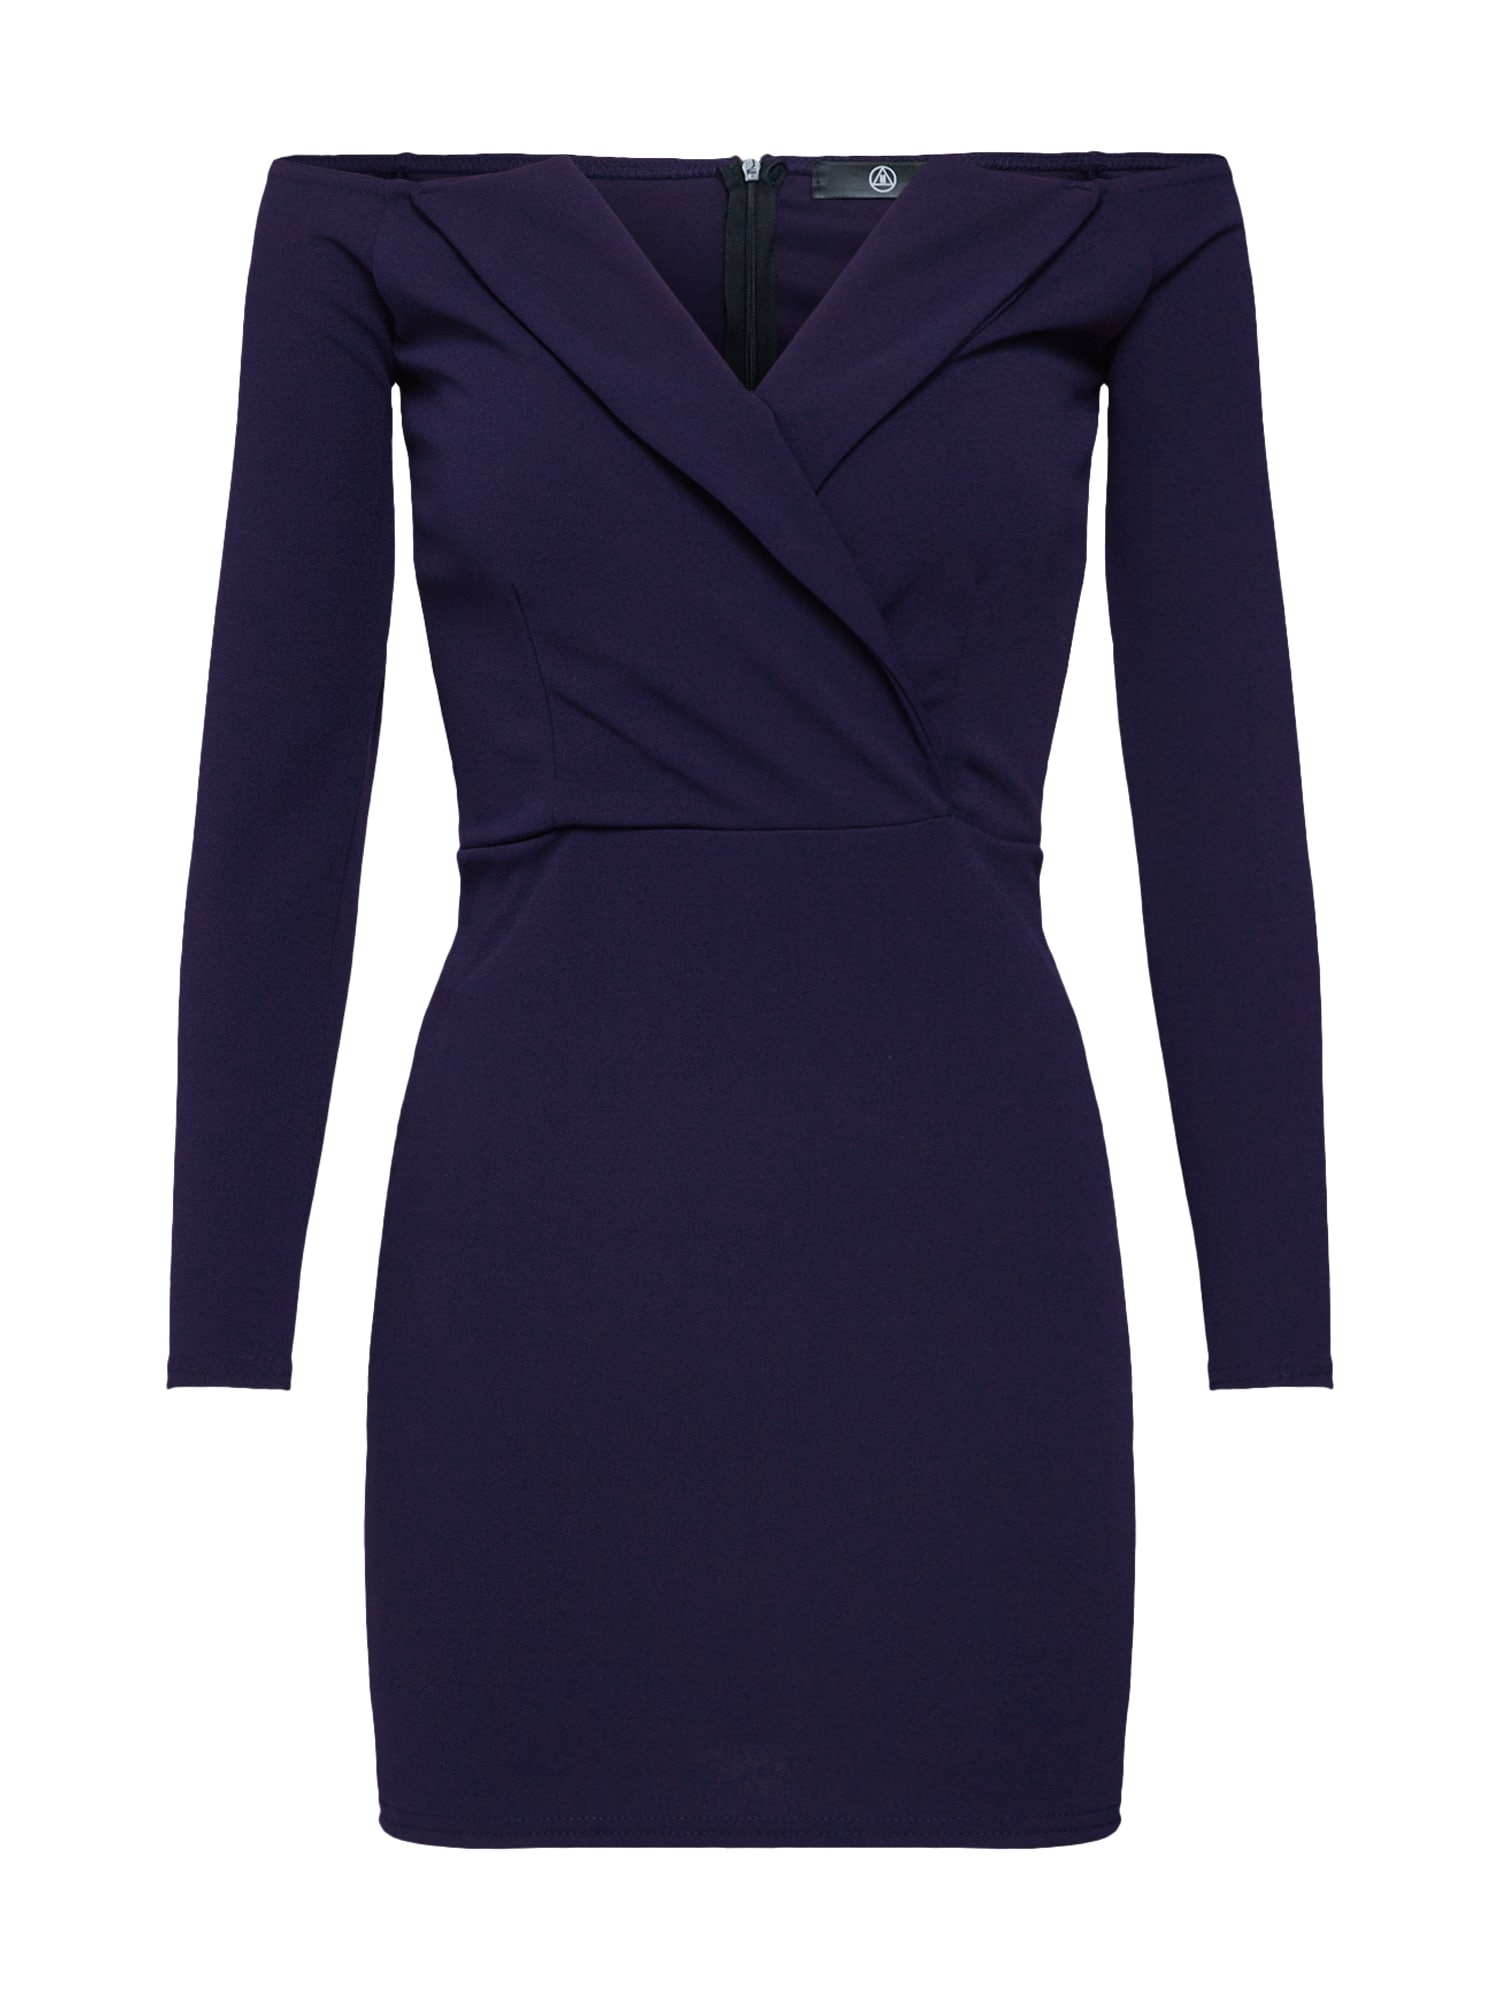 Šaty BARDOT FOLDOVER MINI DRESS tmavě modrá Missguided